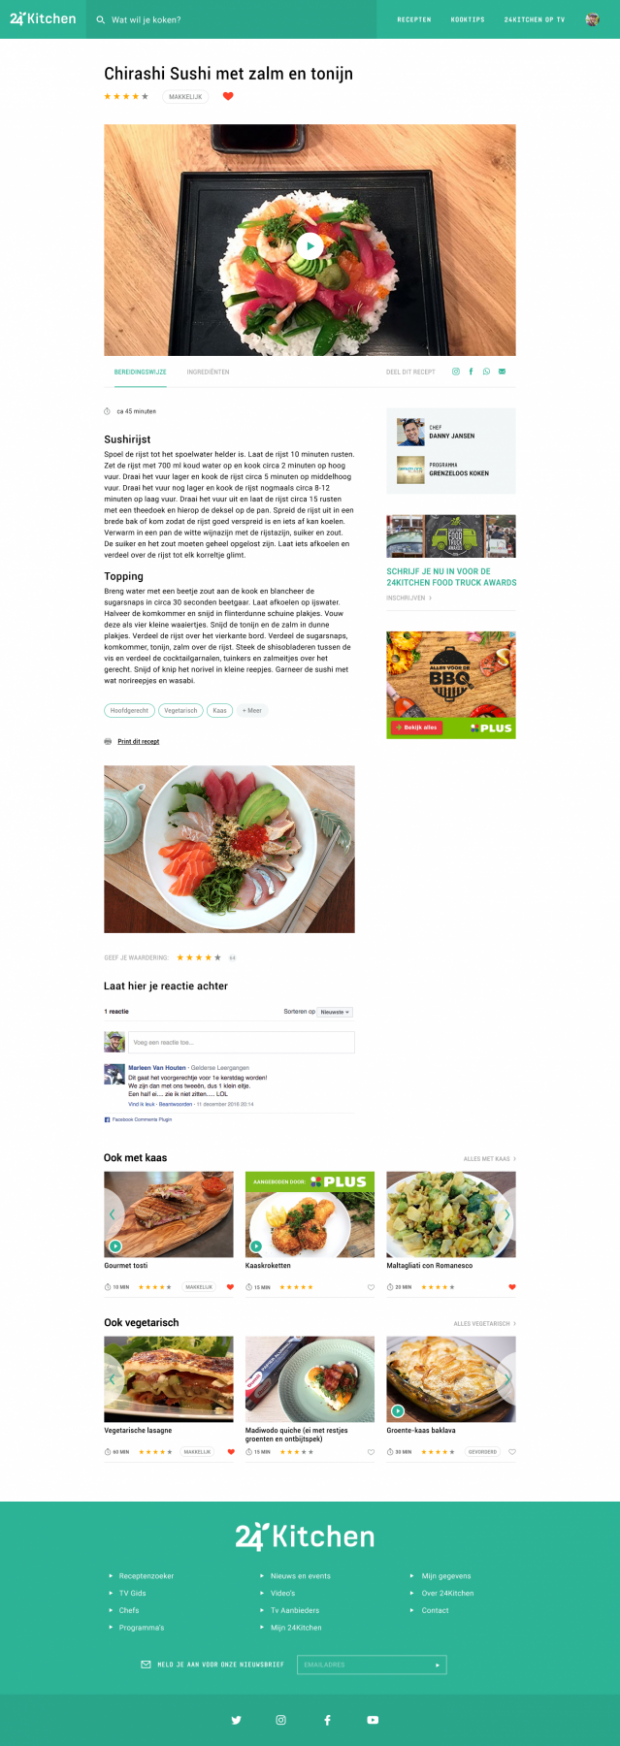 24kitchen The No 1 Website For Food Lovers Drupal Org